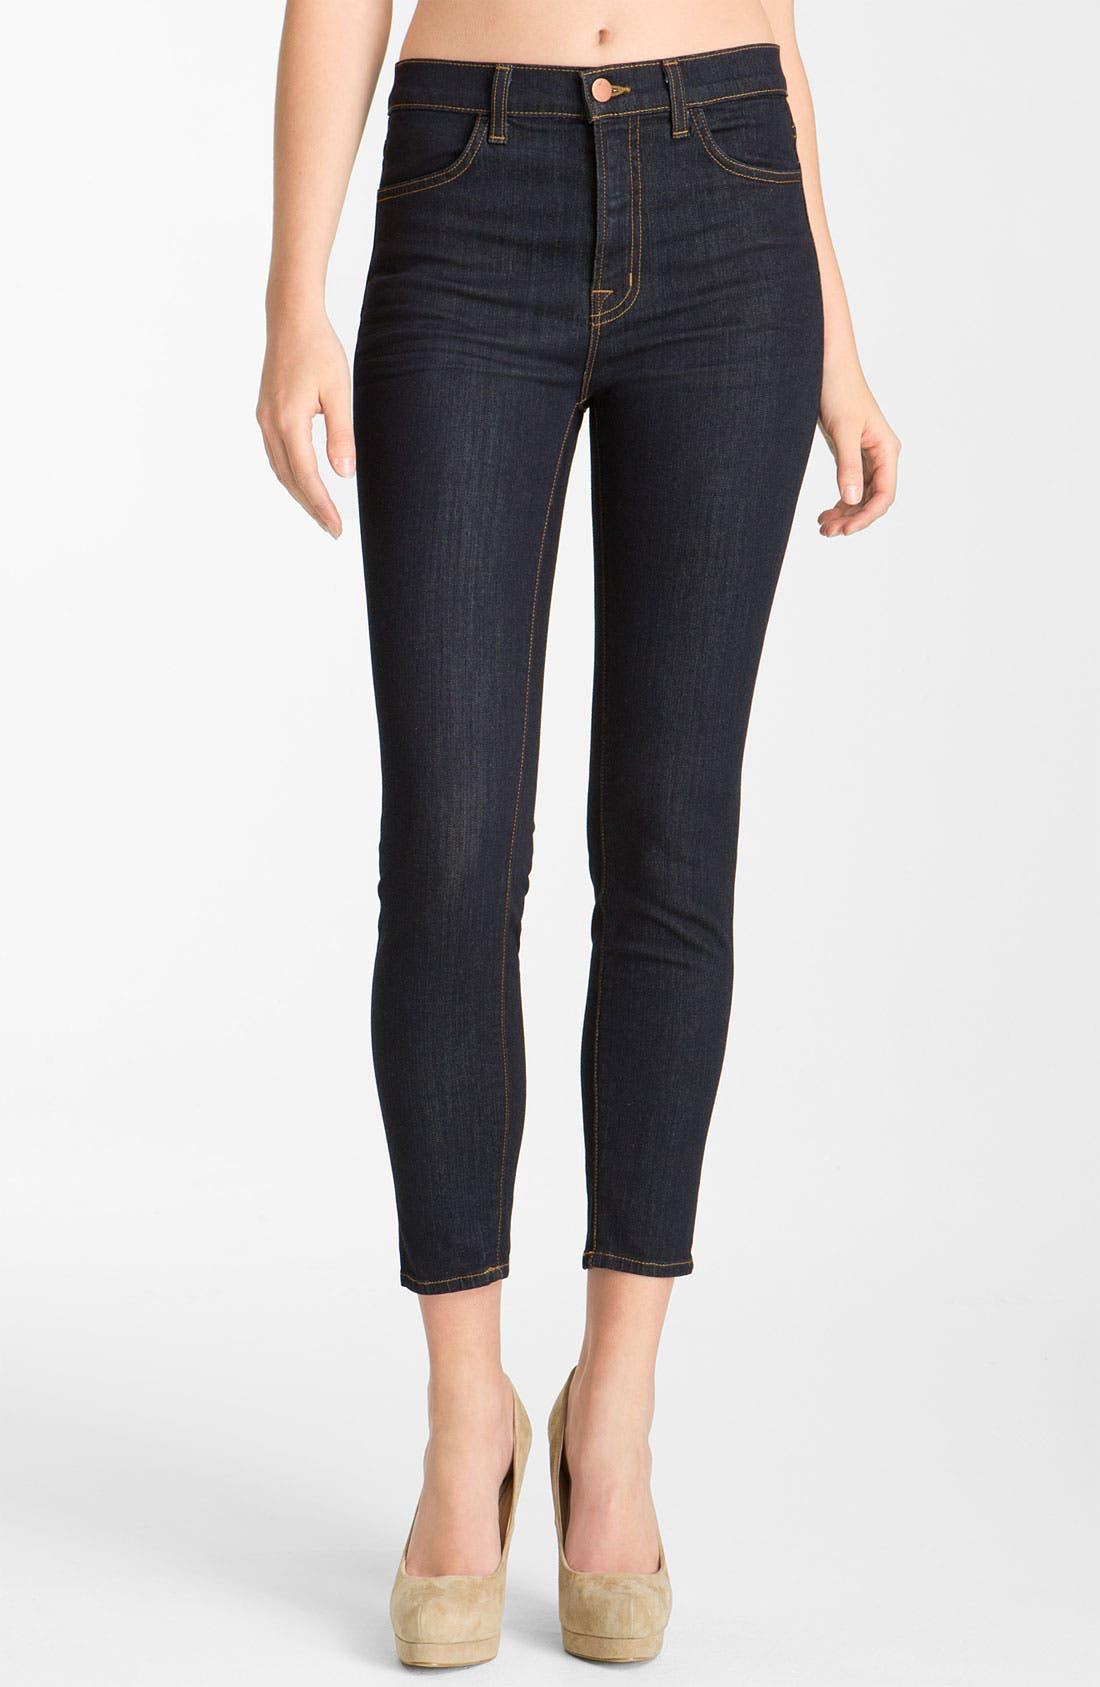 Alternate Image 1 Selected - J Brand 'Maria' Crop Skinny Stretch Jeans (Starless)